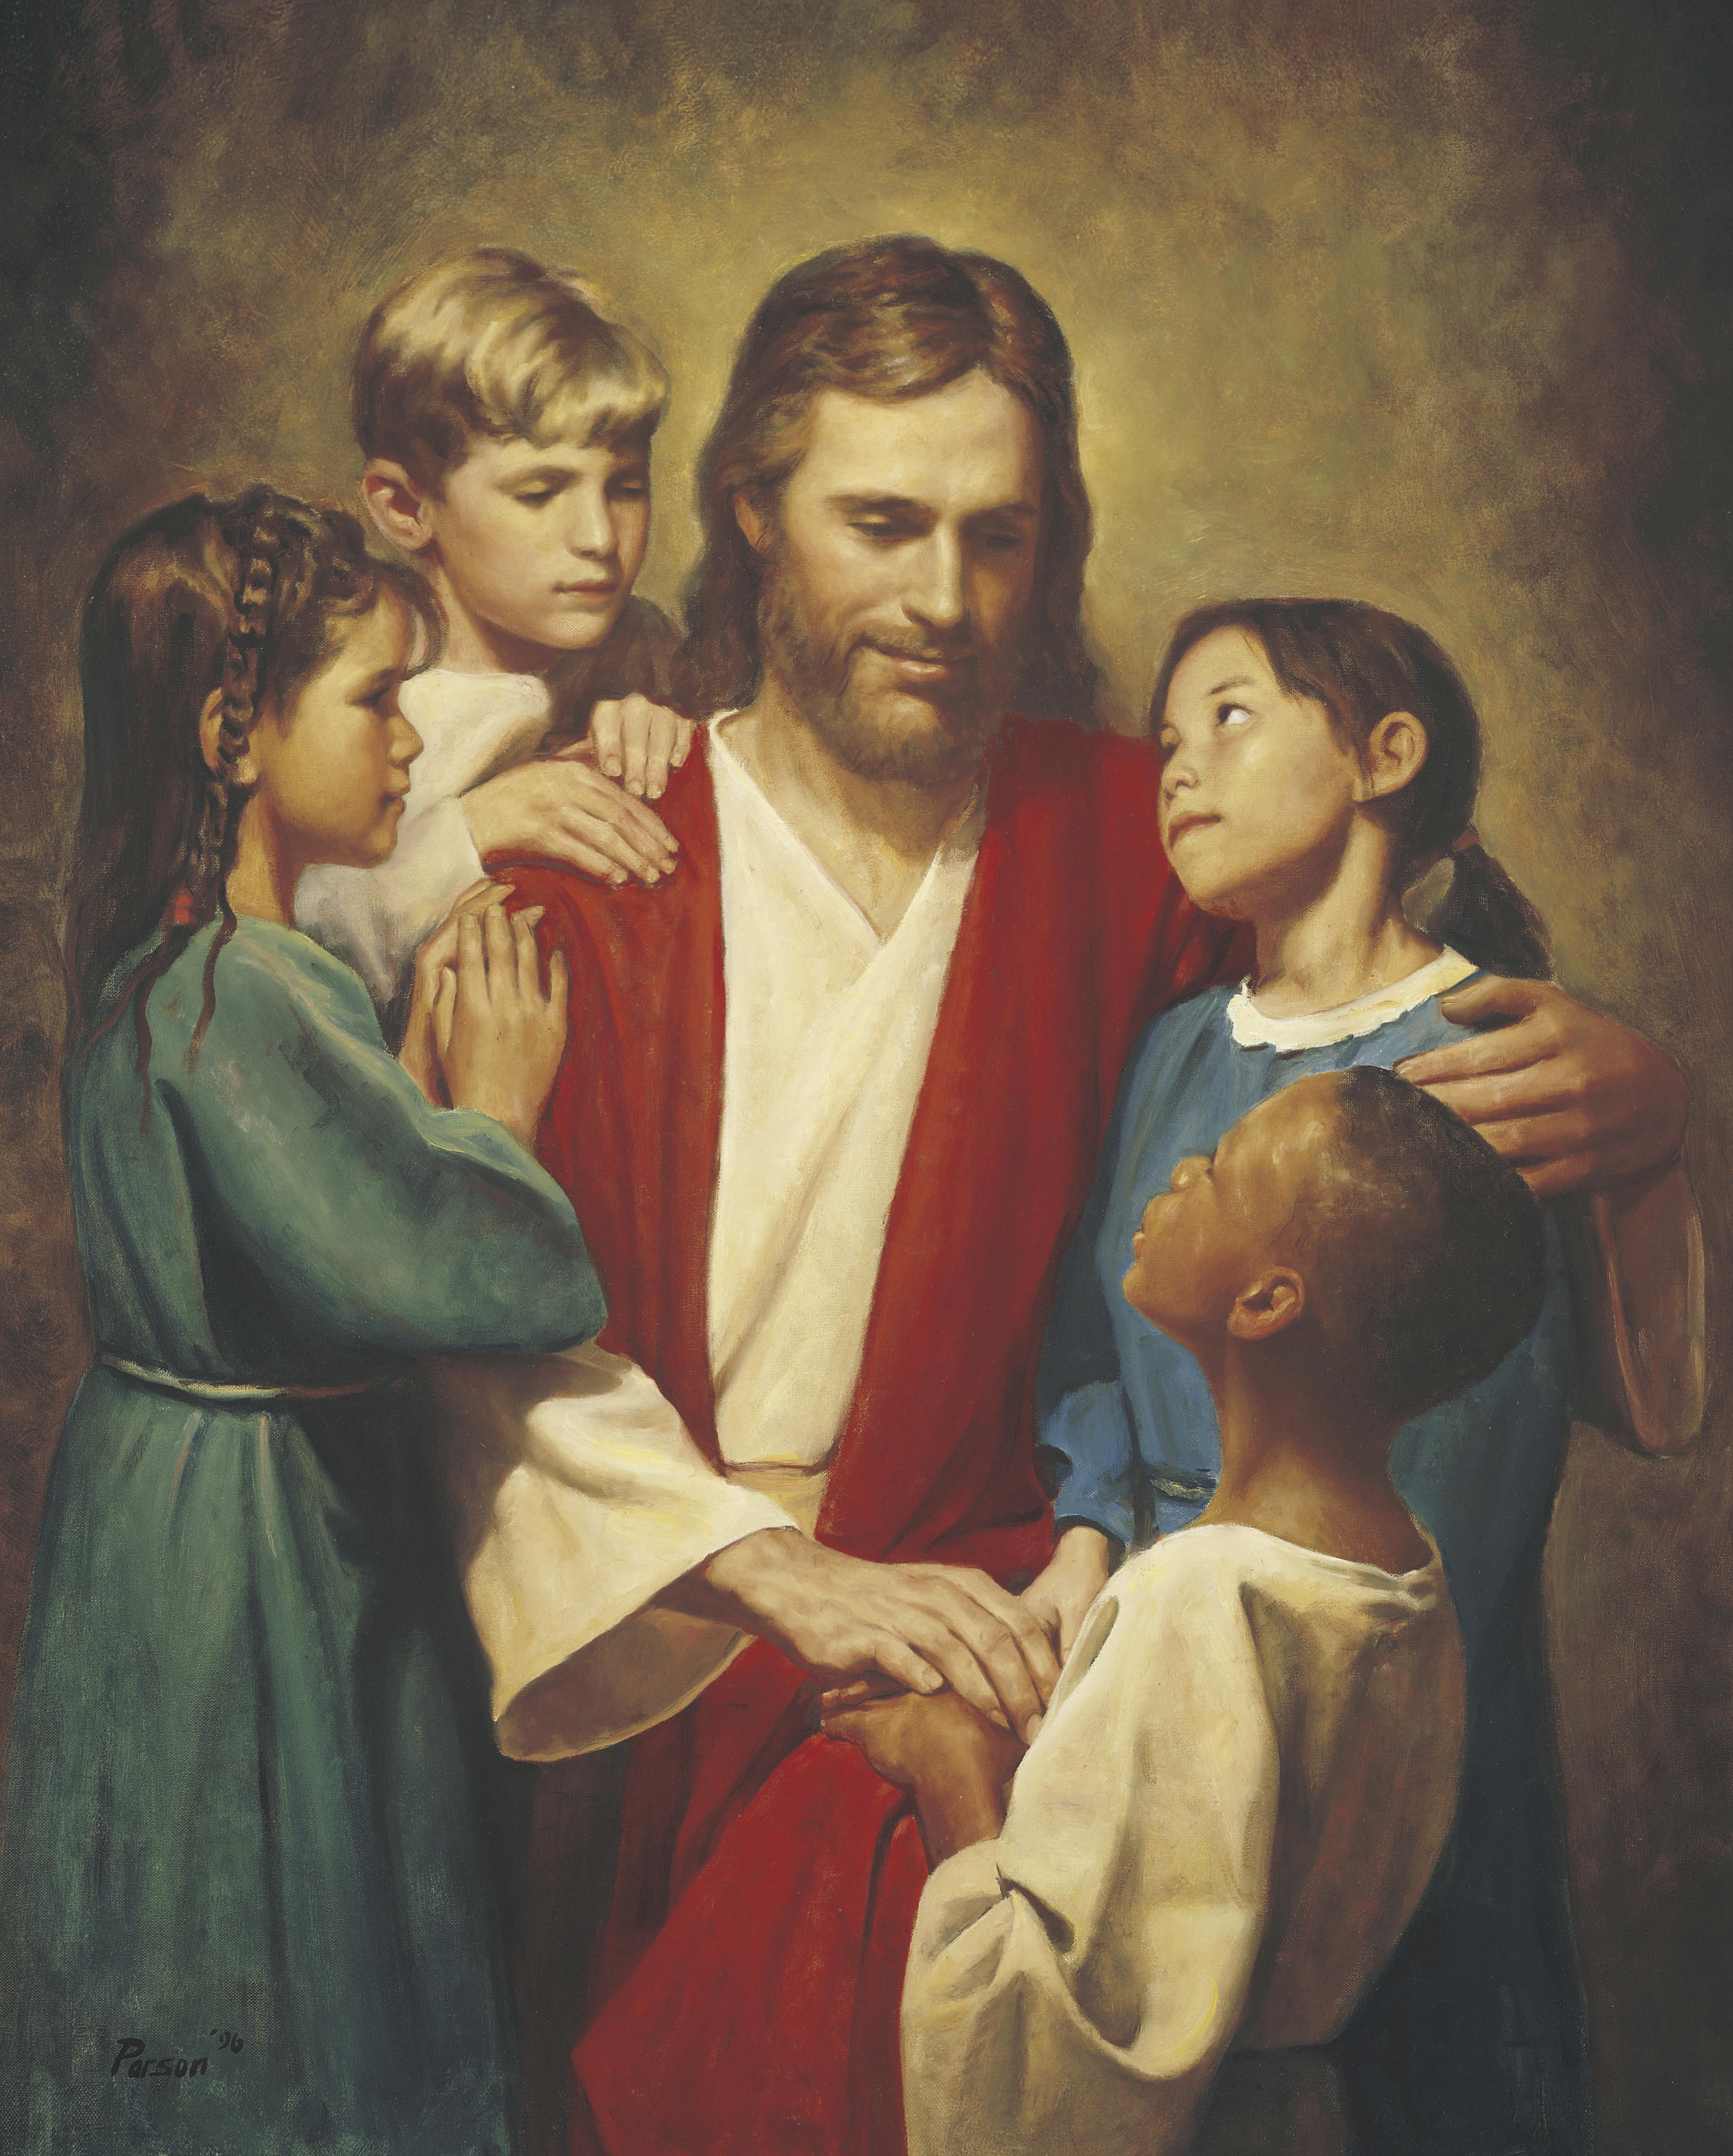 Christ And Children From Around The World Christ With Children